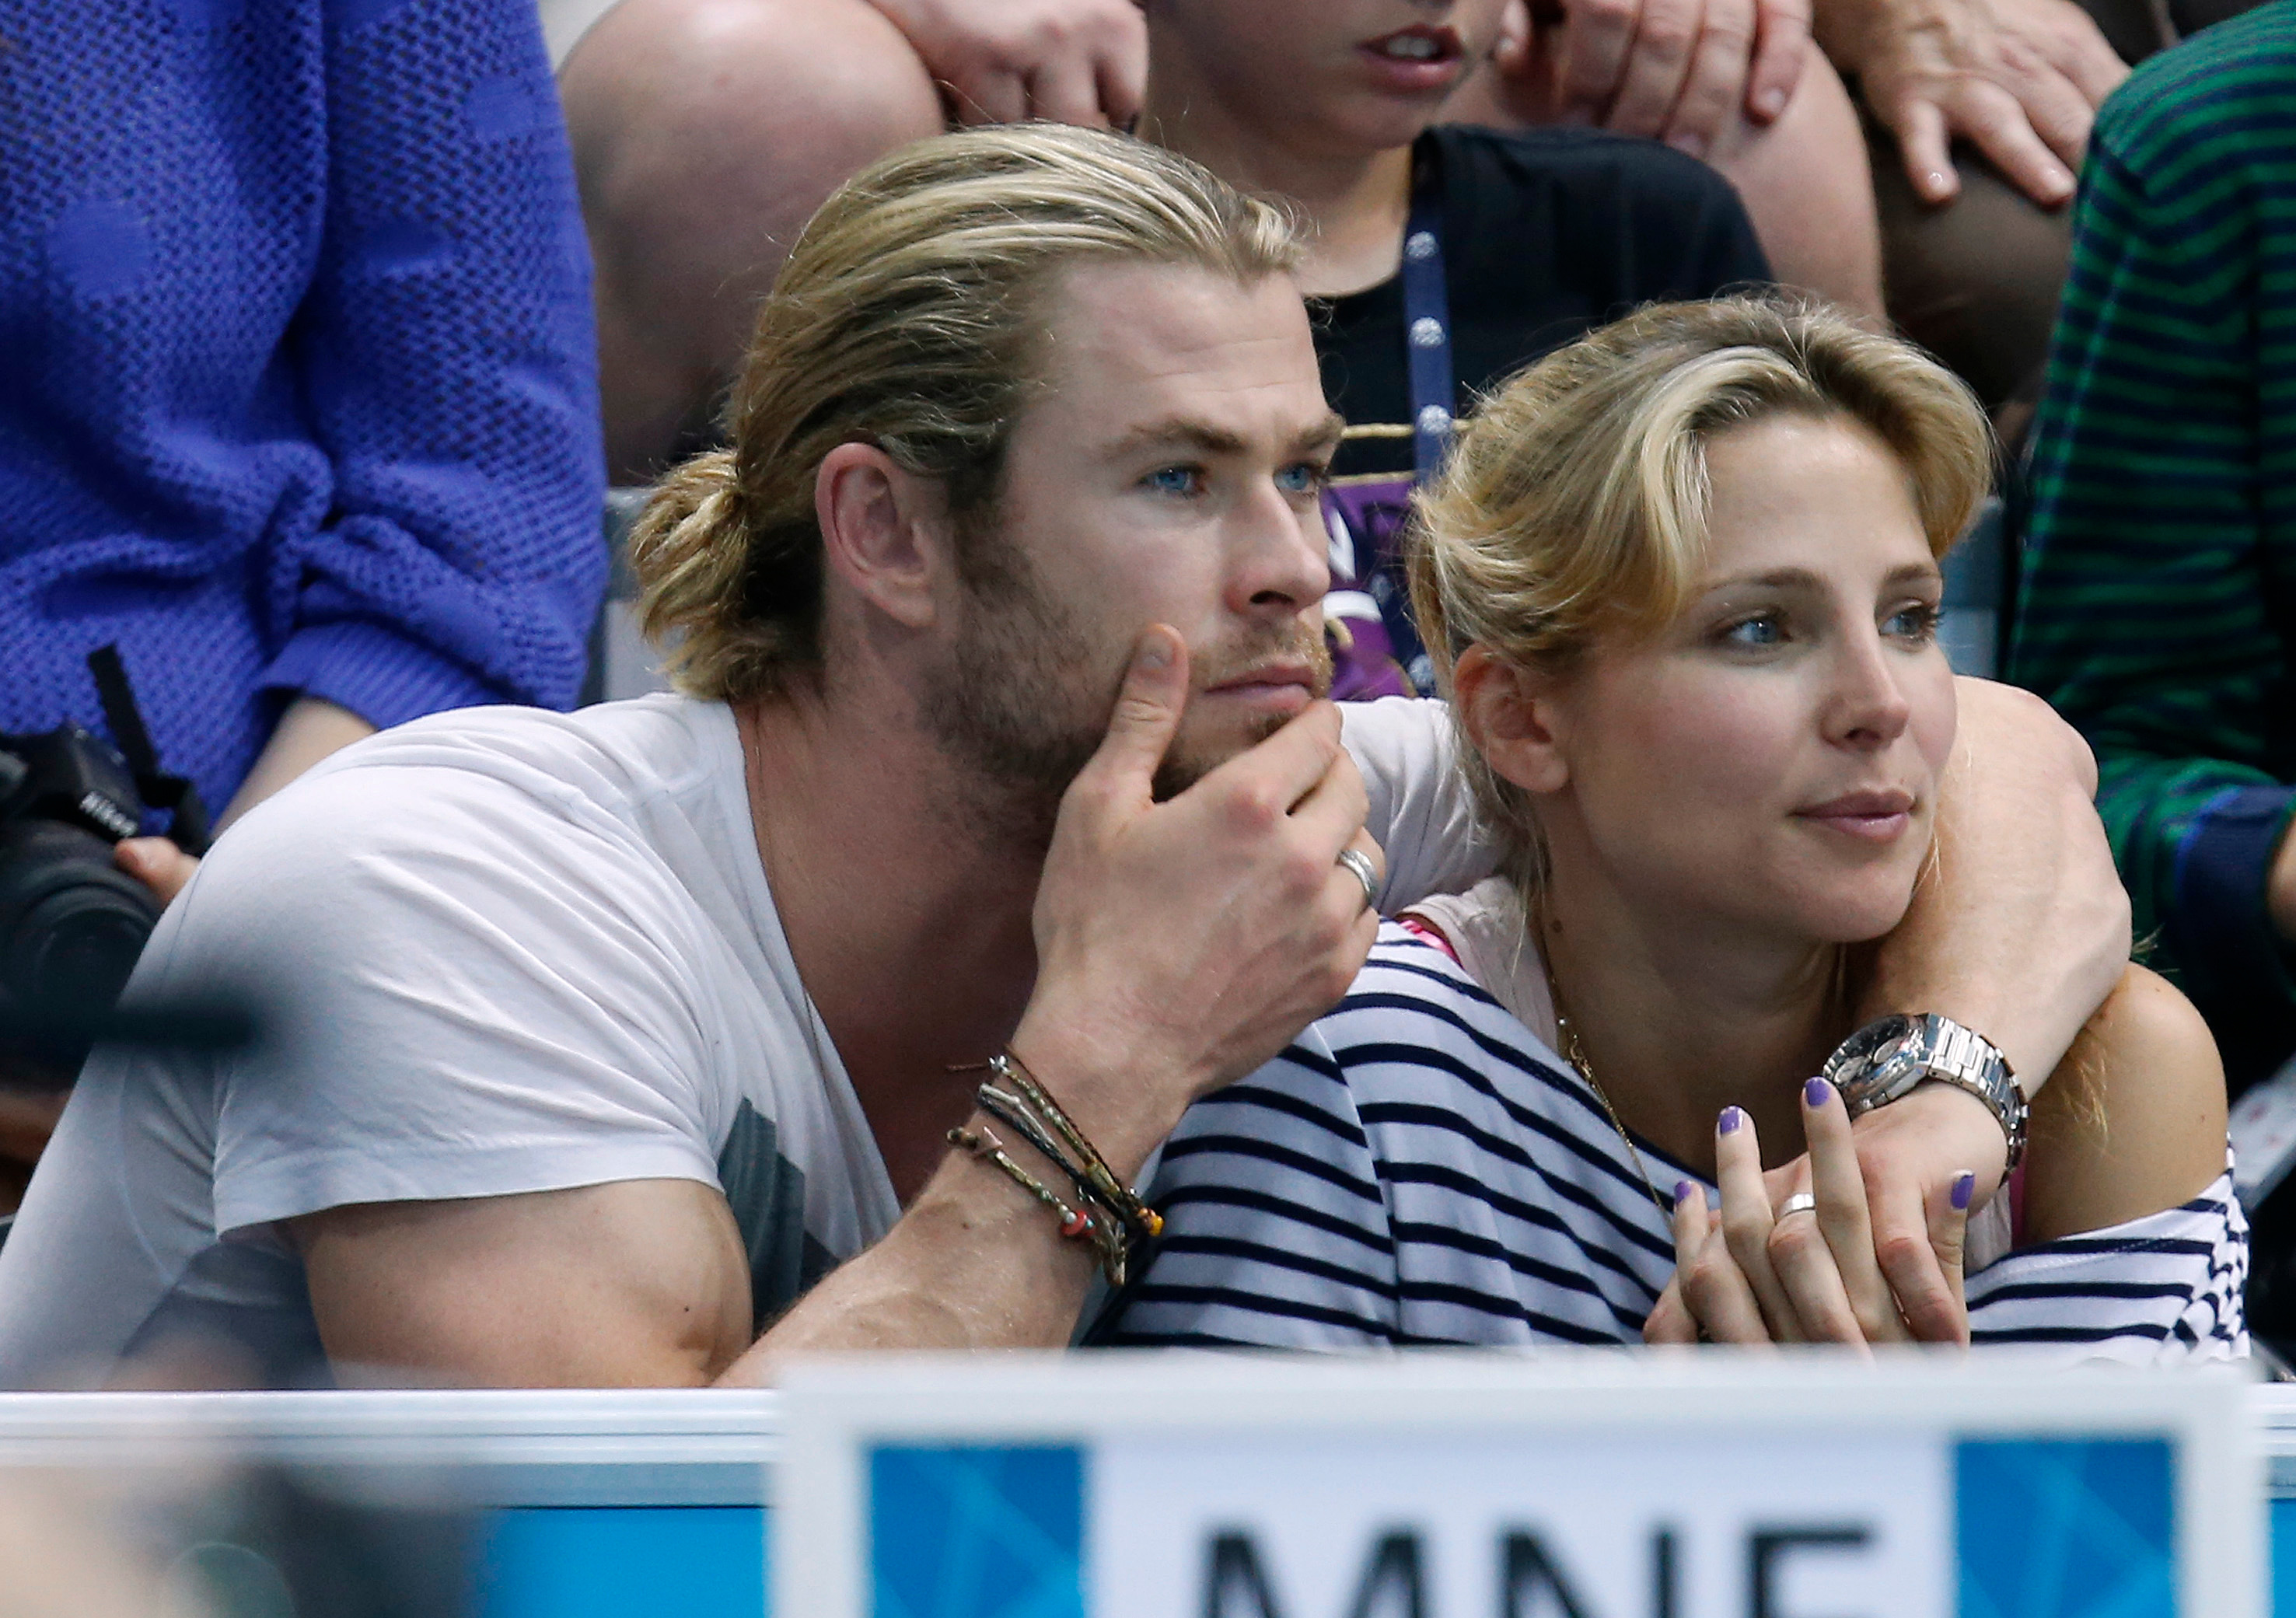 Chris Hemsworth, wife Elsa Pataky, Olympics